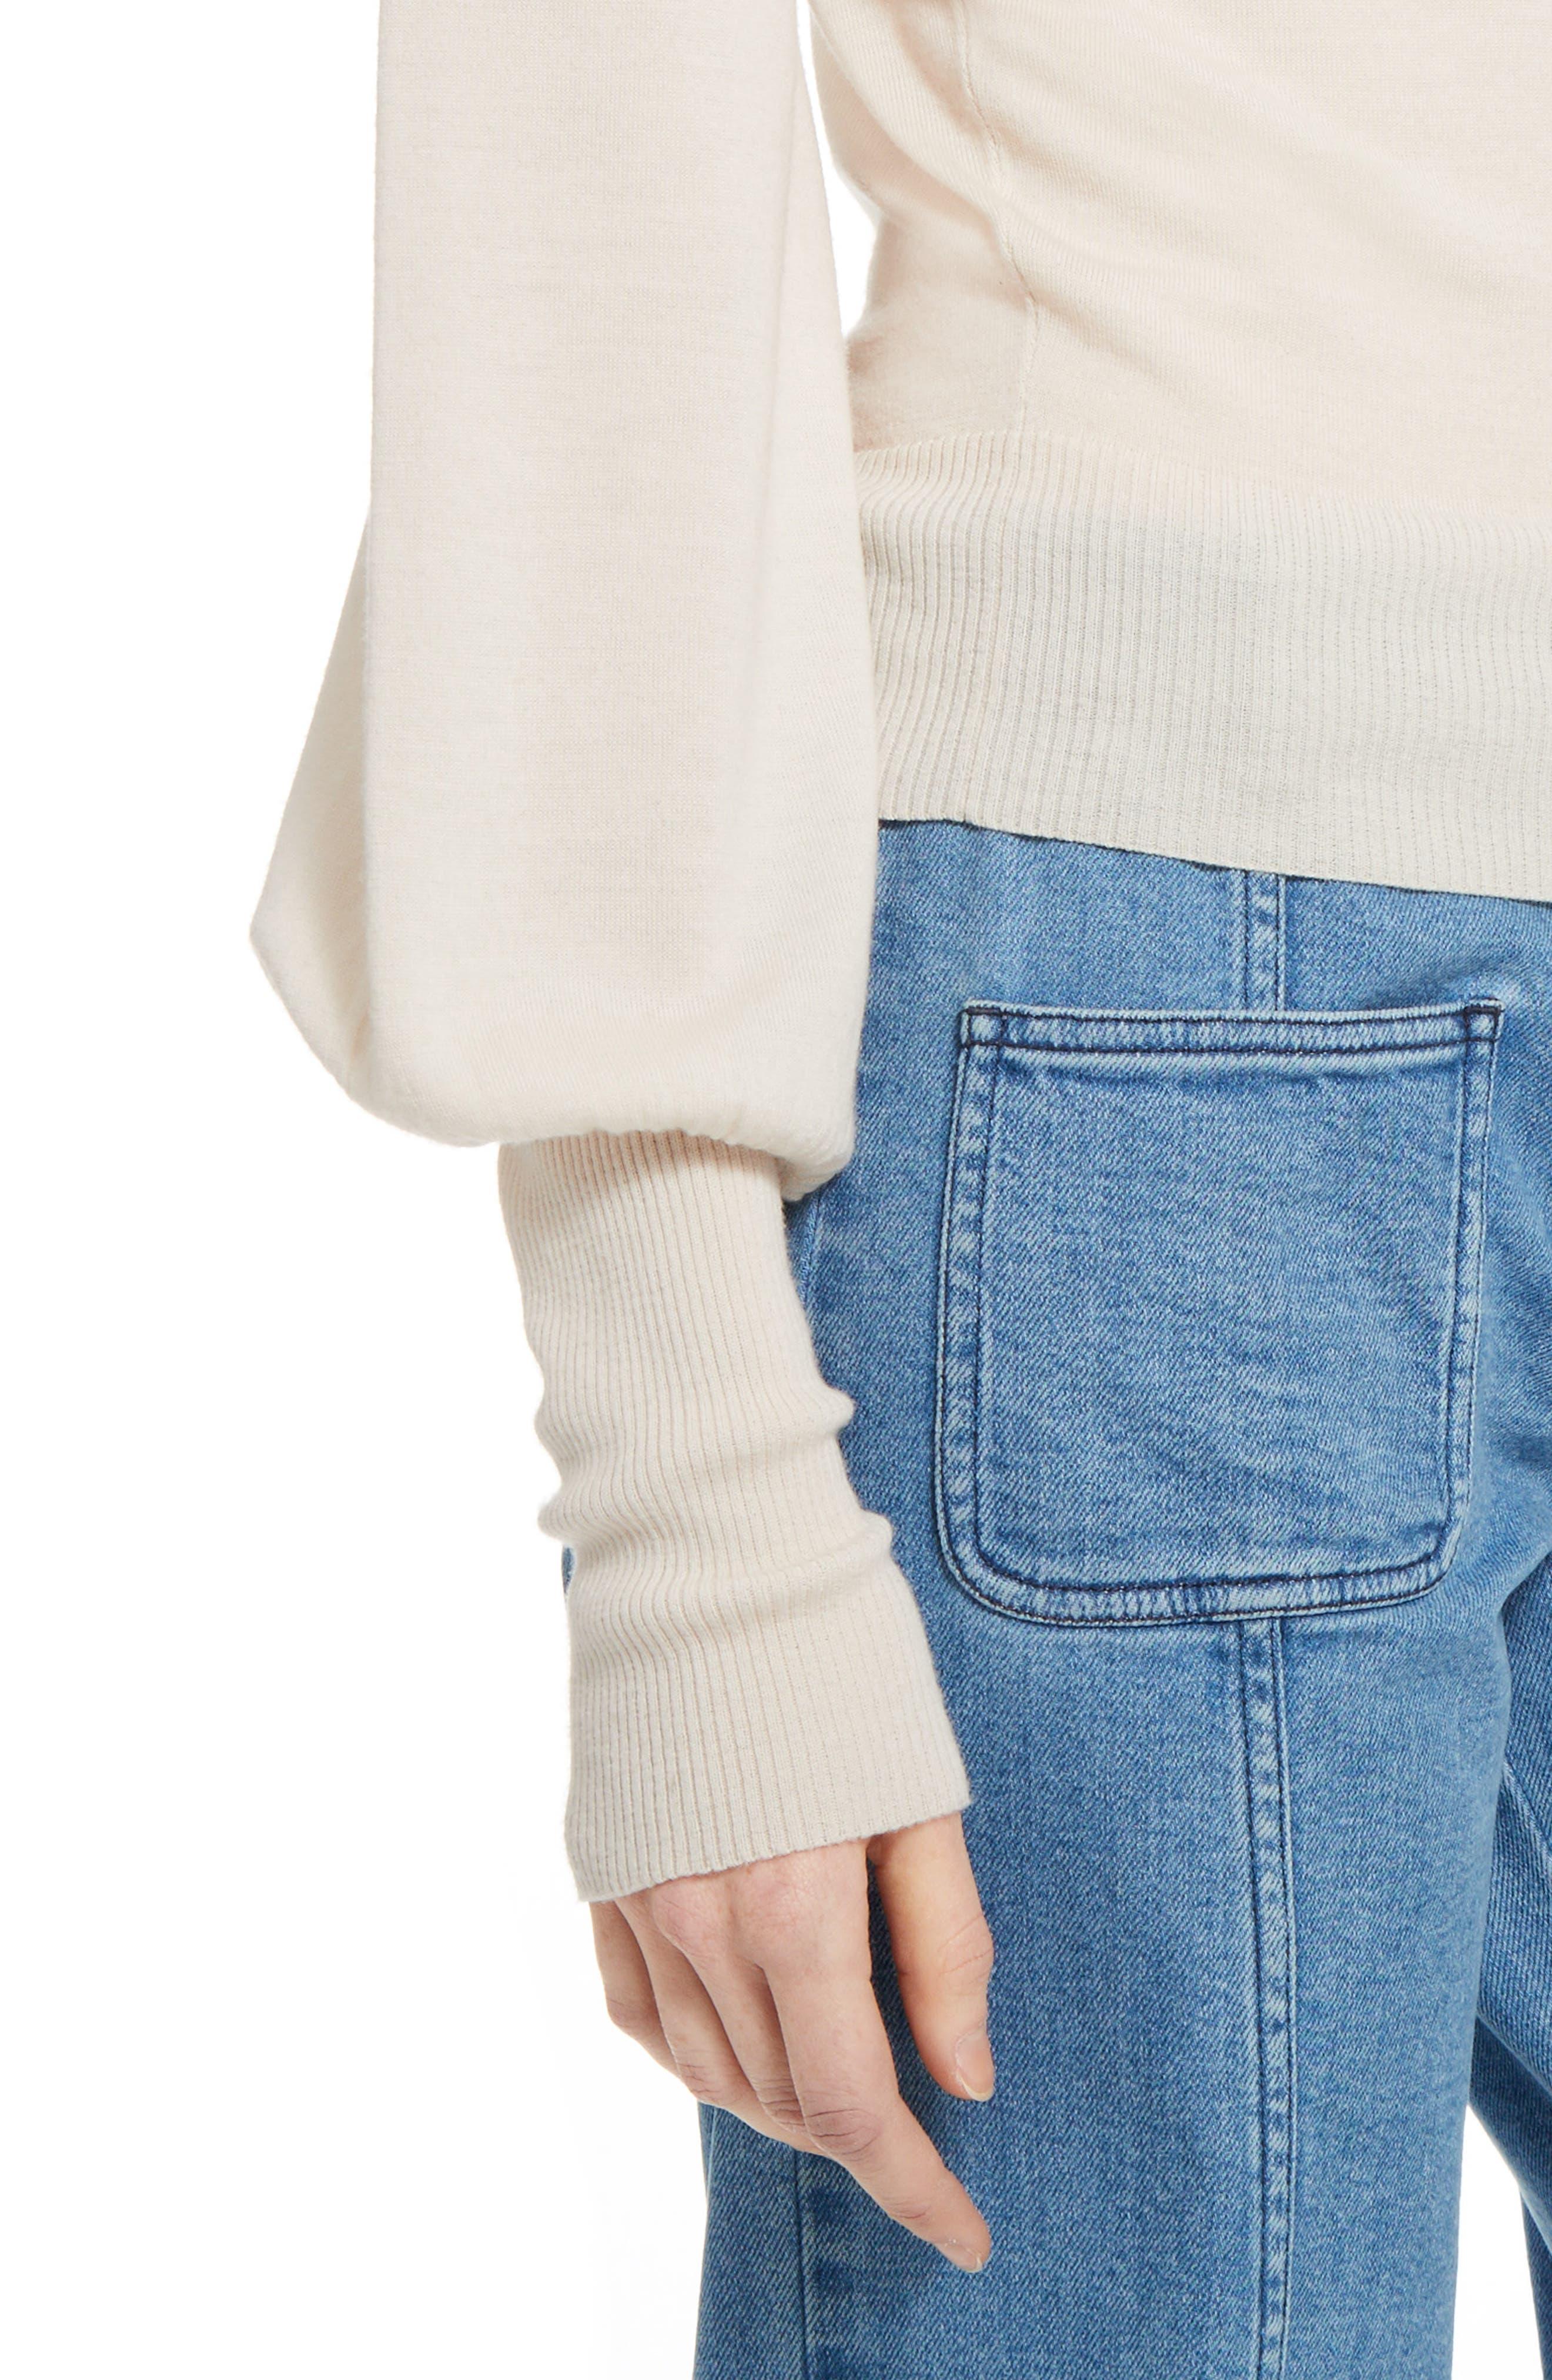 Wool Turtleneck Sweater,                             Alternate thumbnail 4, color,                             901